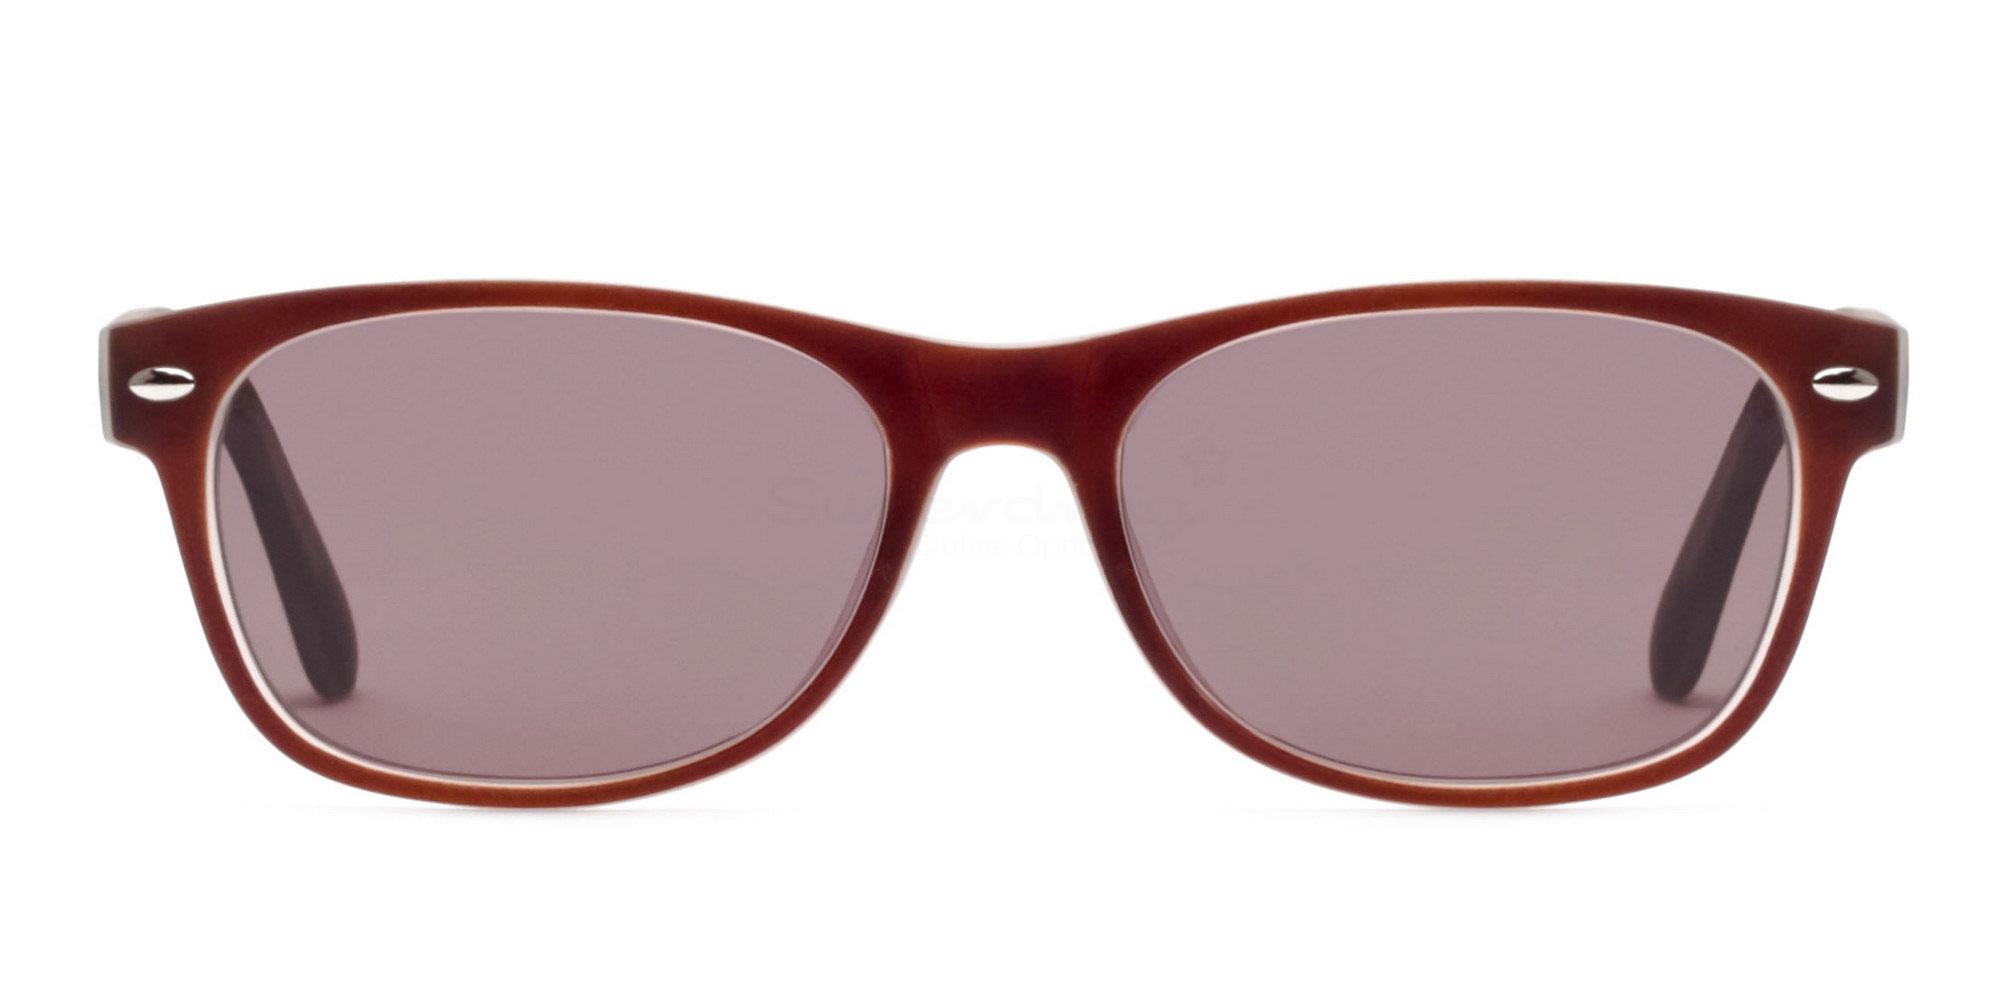 Brown S8122 - Brown (Sunglasses) Sunglasses, Helium